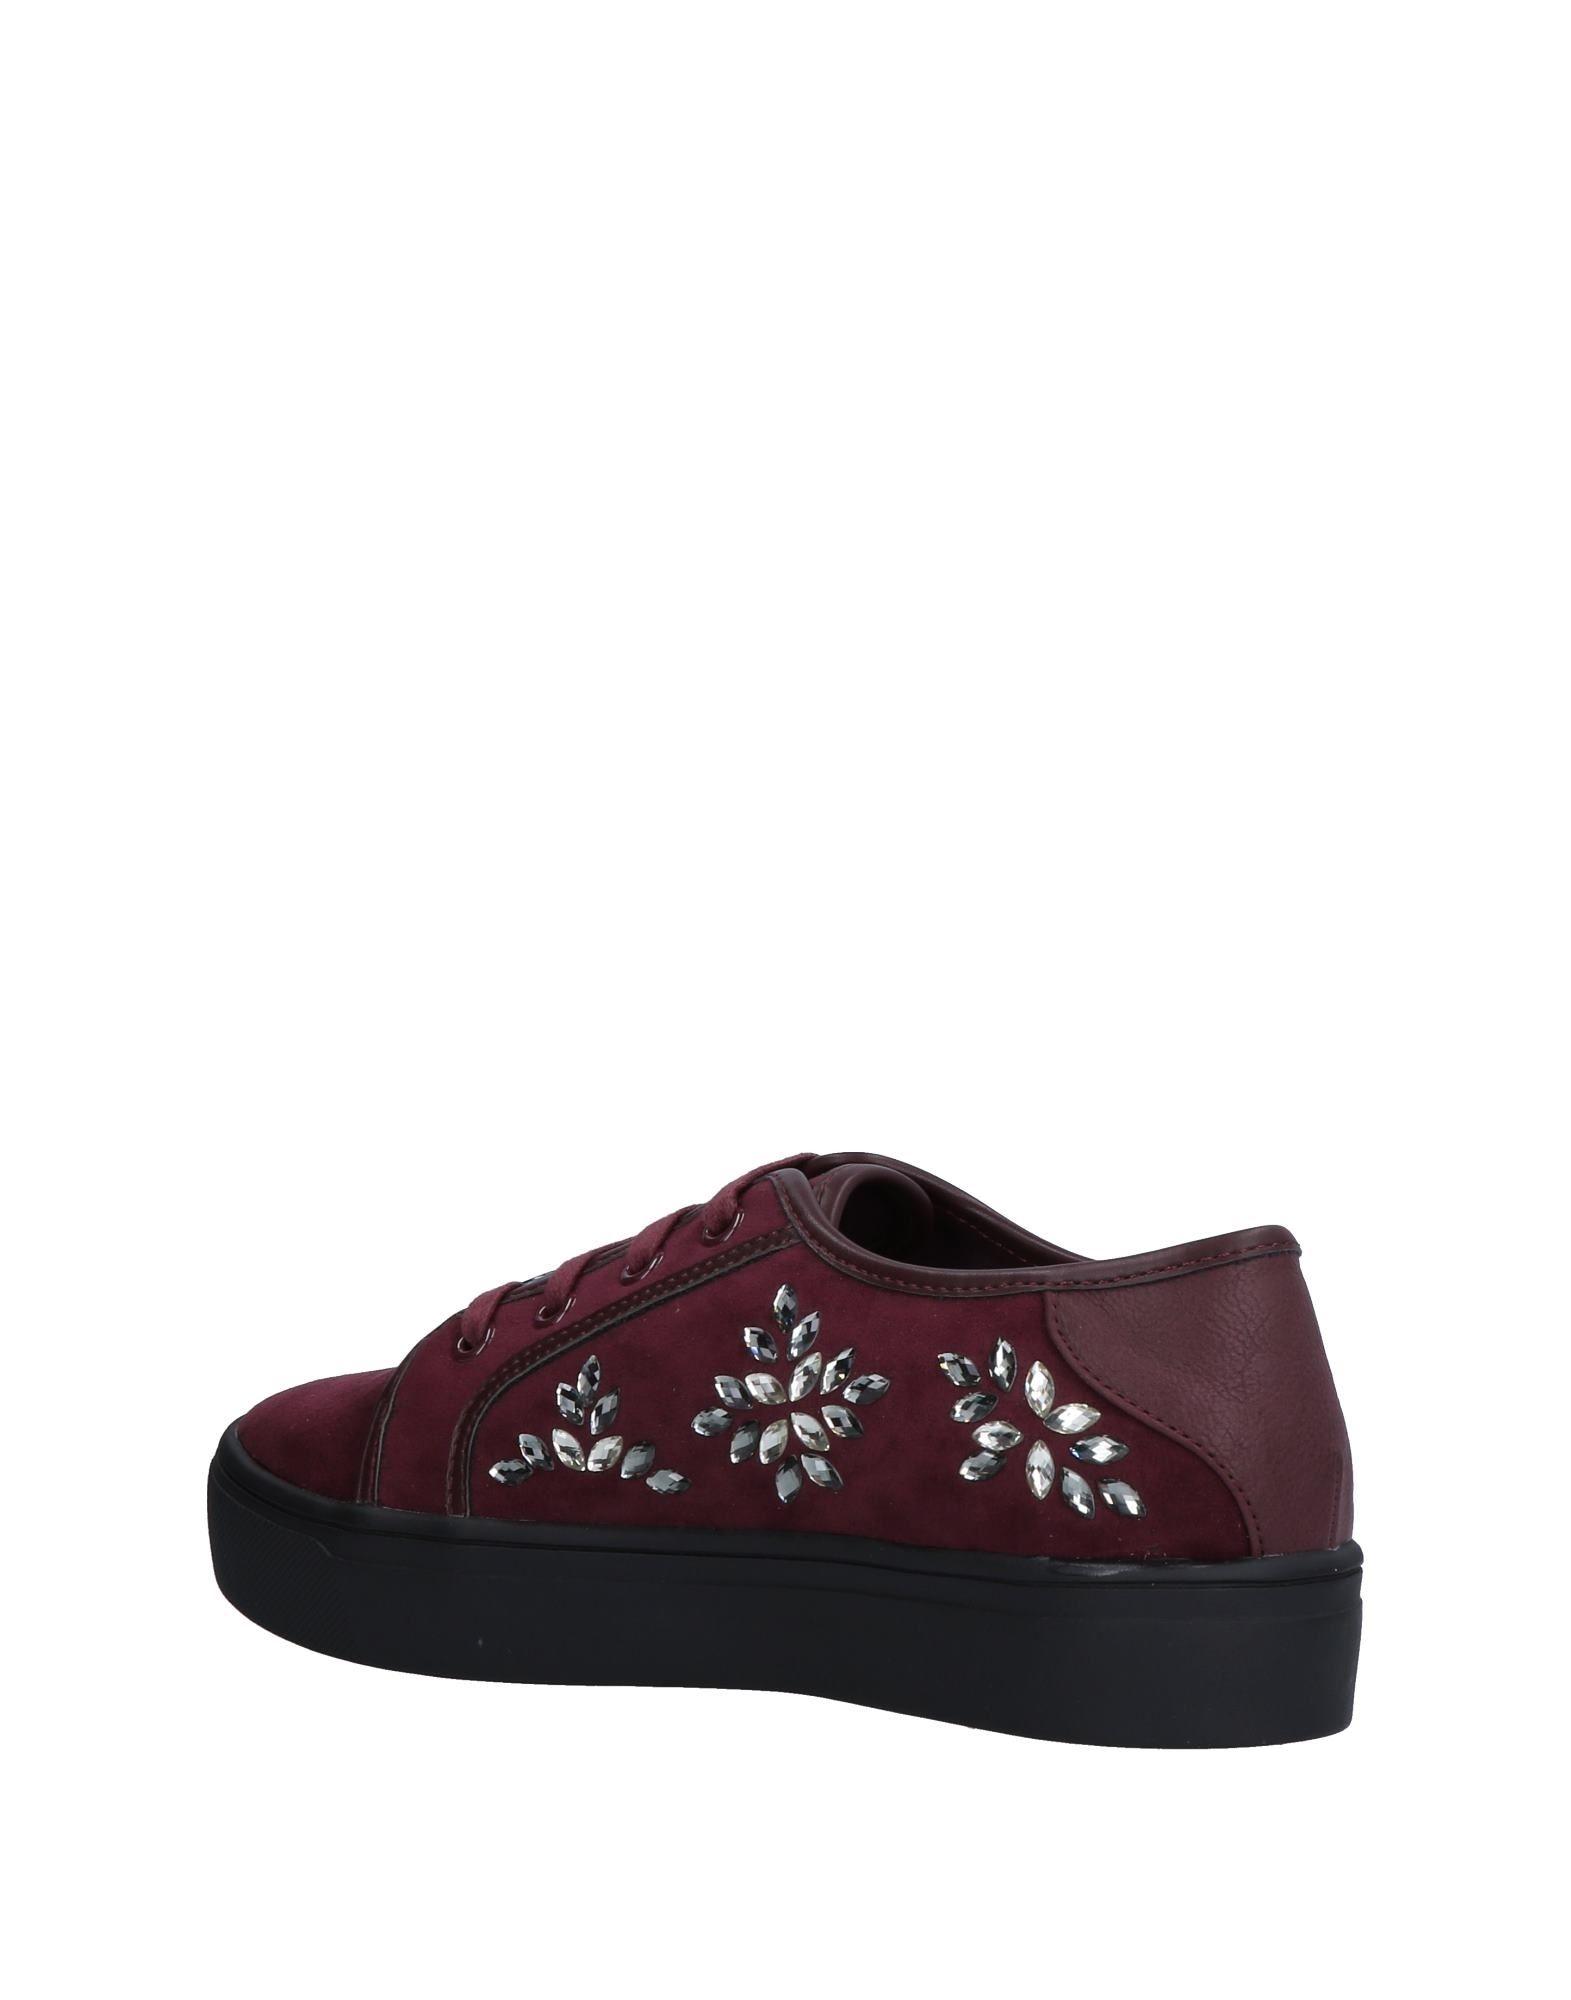 Gattinoni Gute Sneakers Damen  11517037DG Gute Gattinoni Qualität beliebte Schuhe 3128e3